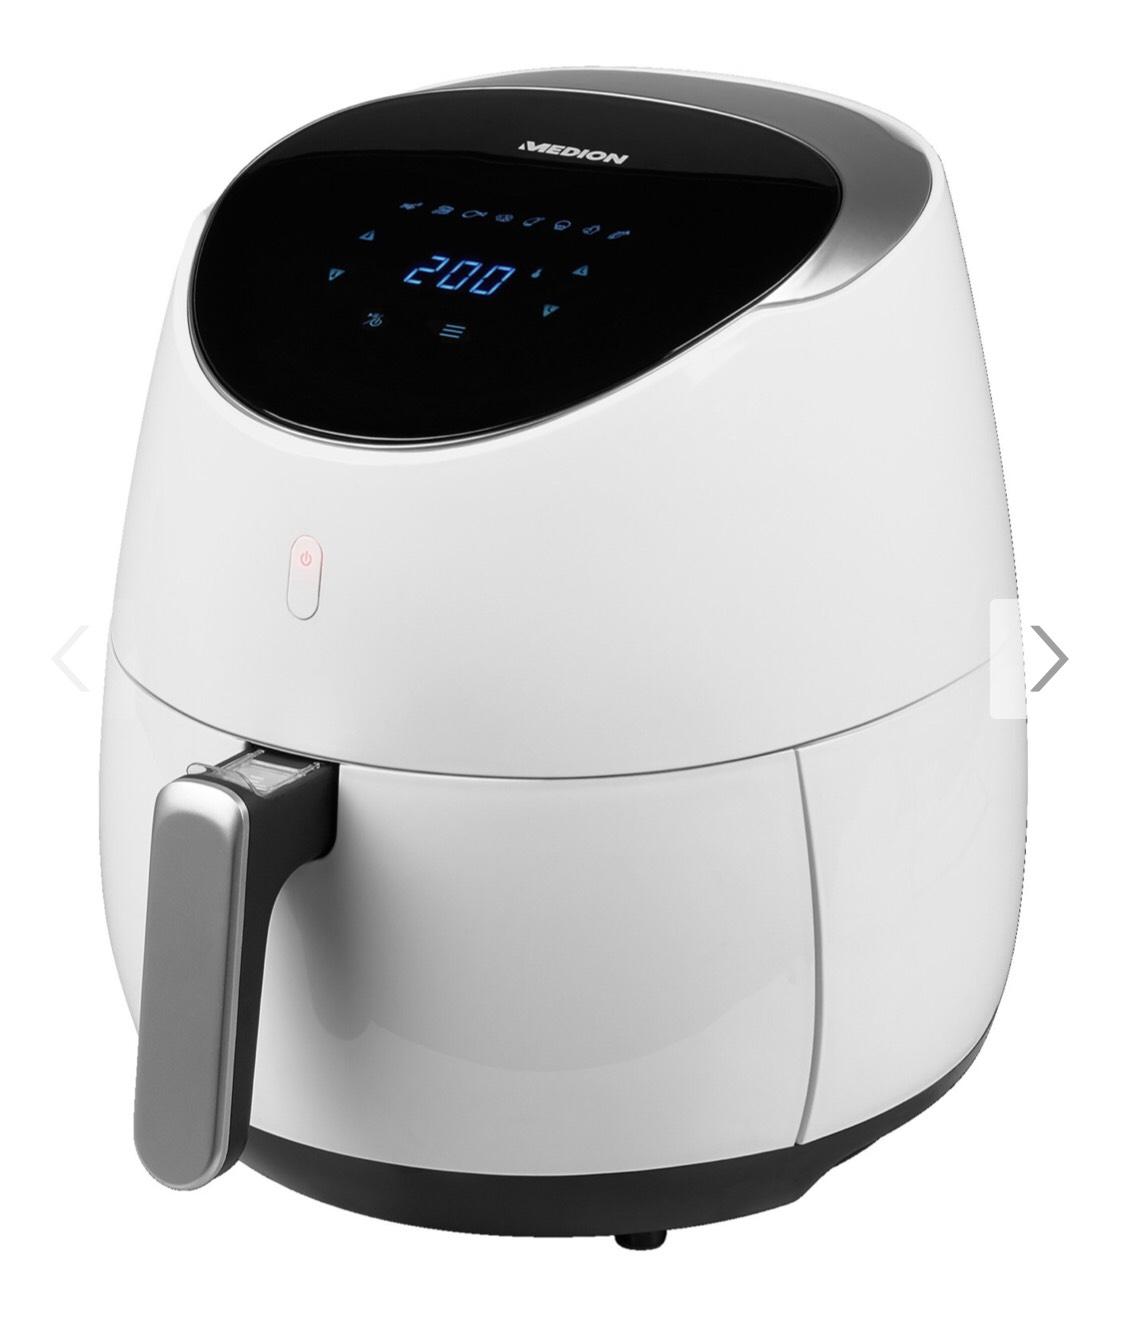 MEDION® XXL Heißluftfritteuse MD 18290, 4,5 L Fassungsvermögen, 2.000W Leistung, benötigt kaum Öl, 8 Automatikprogramme